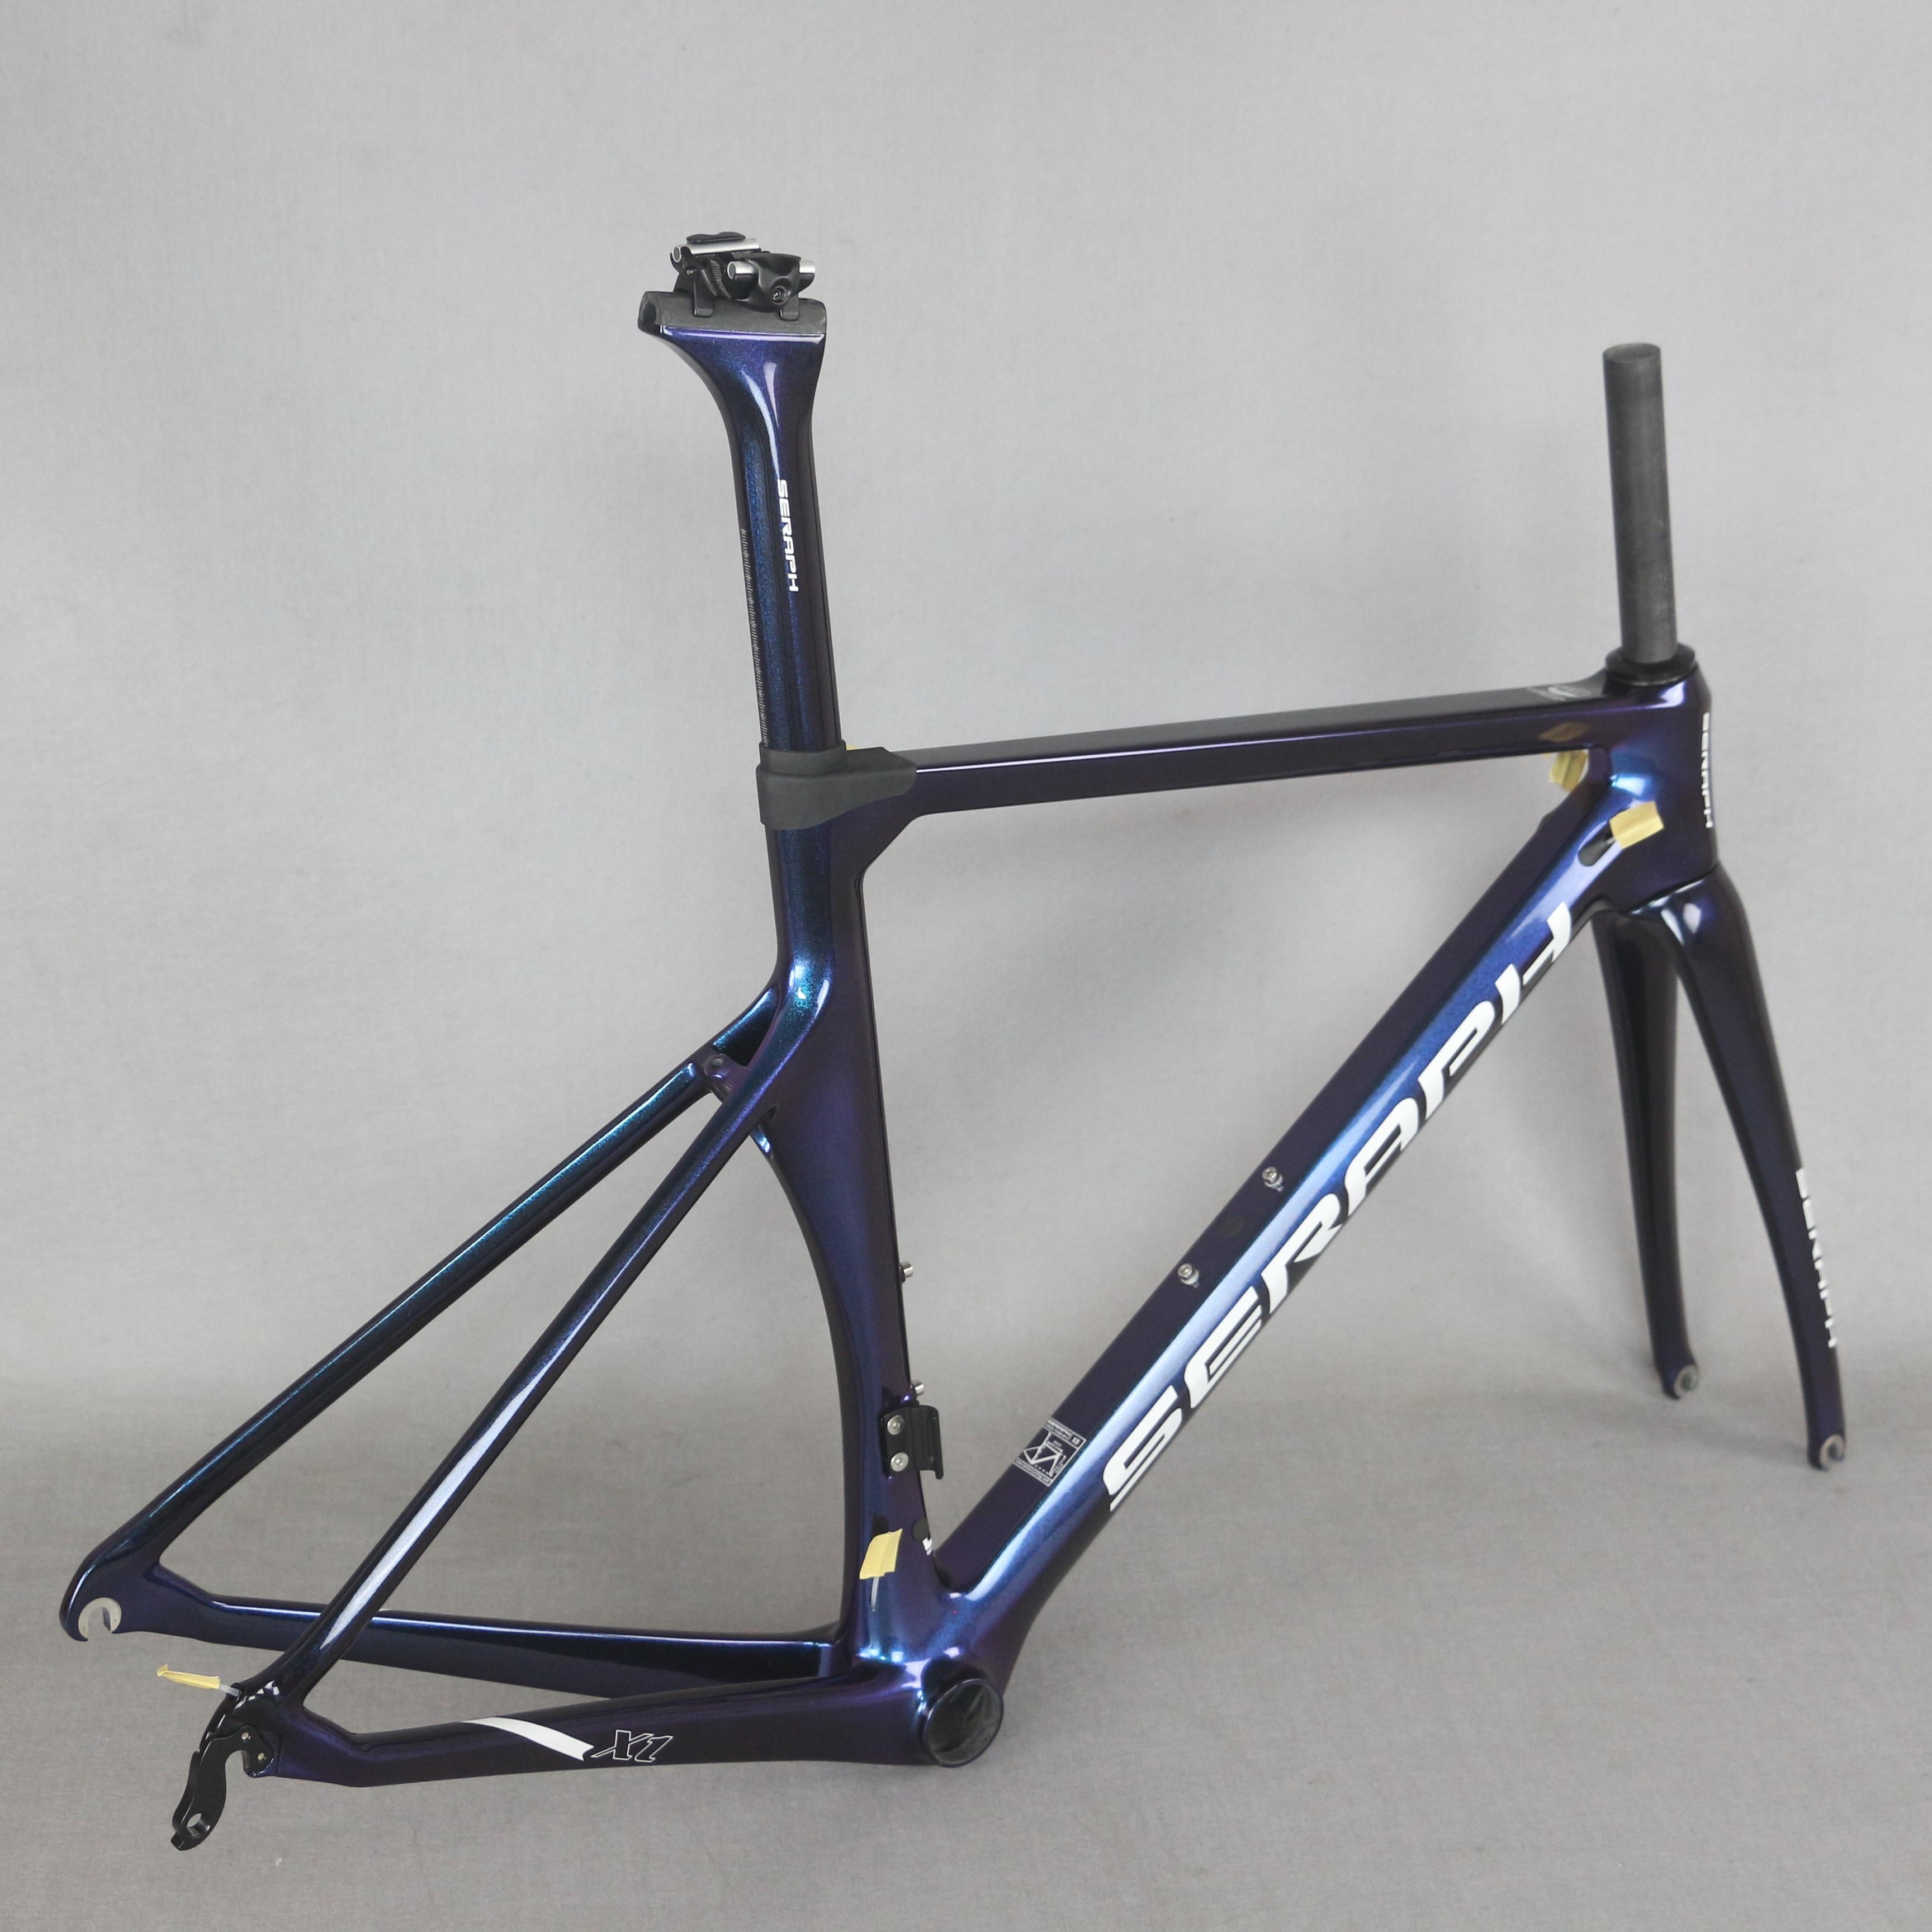 SERAPH Chameleon Paint Road Bike Carbon Road Frame Tt-x1 Accepts Custom Spray Paint Patterns